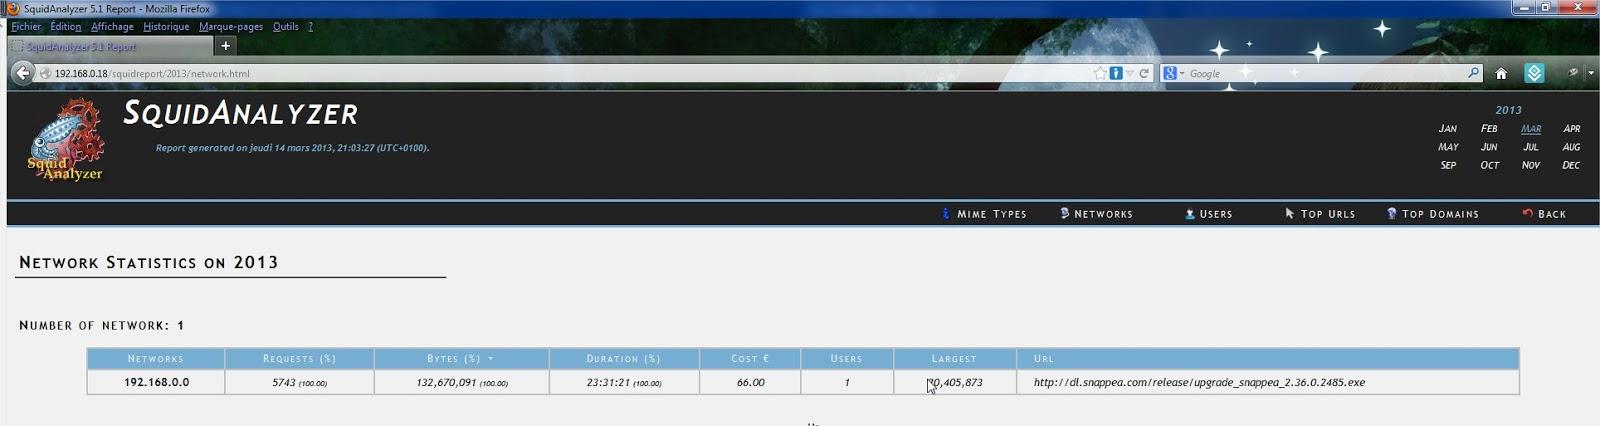 SquidAnalyzer+5.1+Report+-+Mozilla+Firef